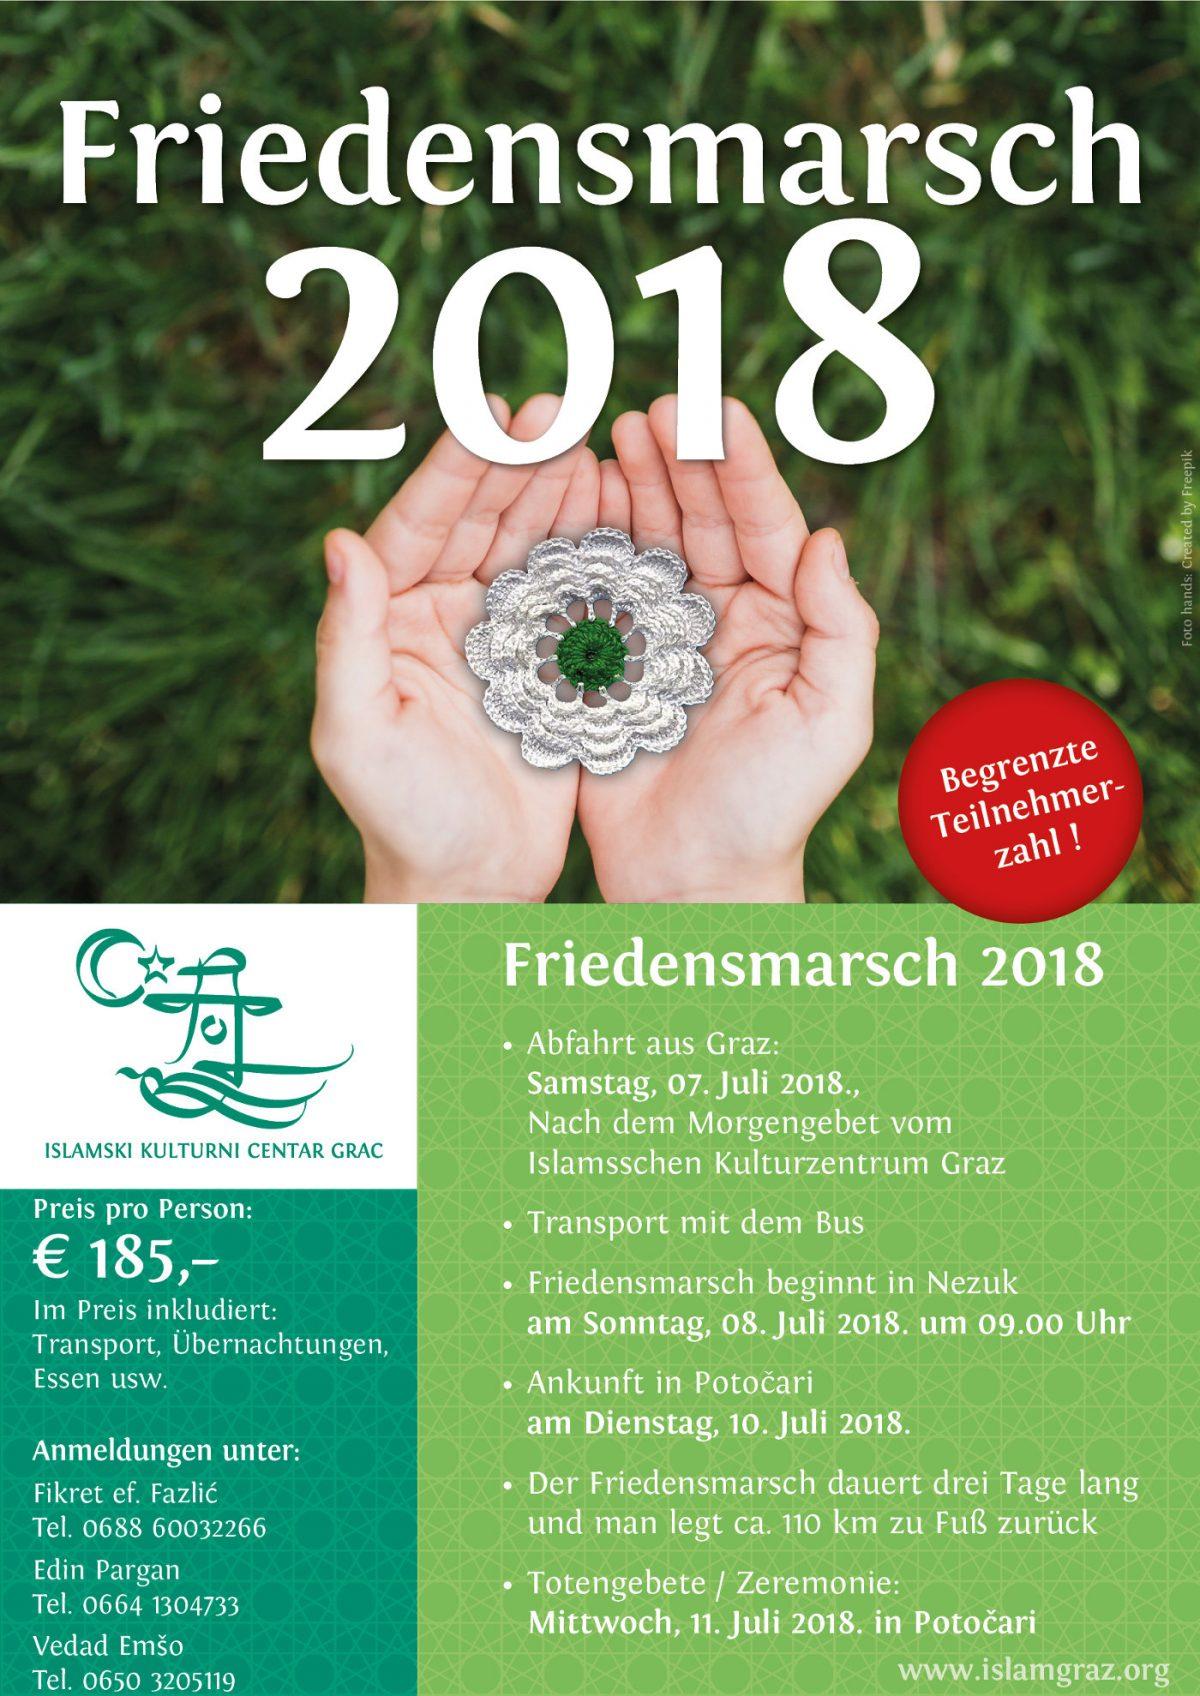 Friedensmarsch 2018